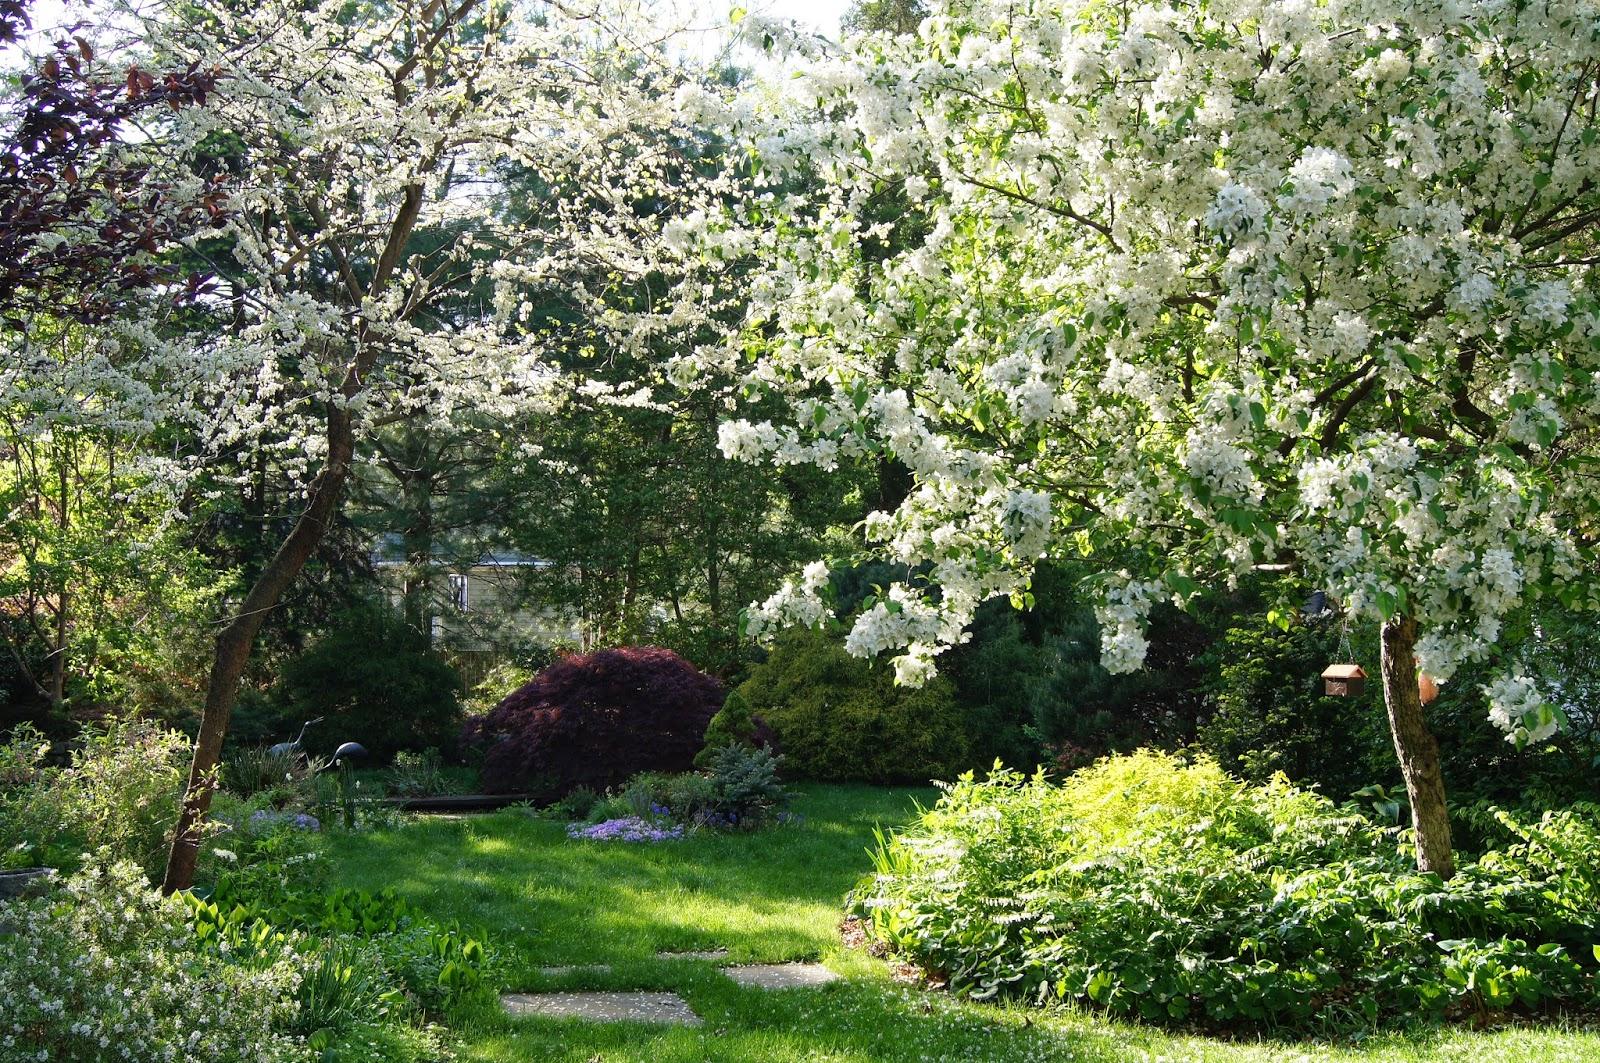 The Sustainable-Enough Garden: My journey toward sustainable gardening